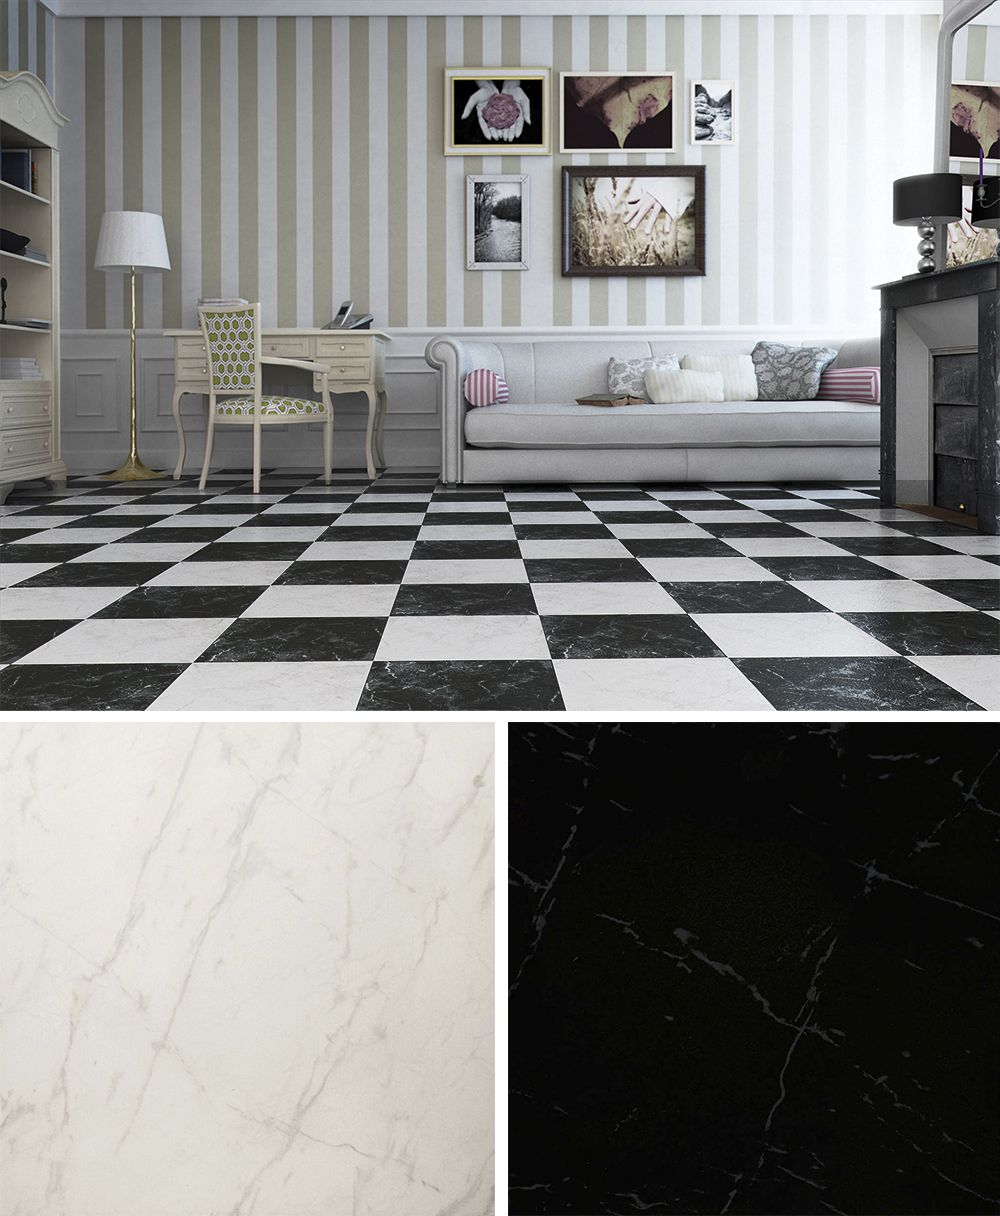 Black Gloss Kitchen Floor Tiles: Otono Marble Effect Black And White Floor Tiles. A